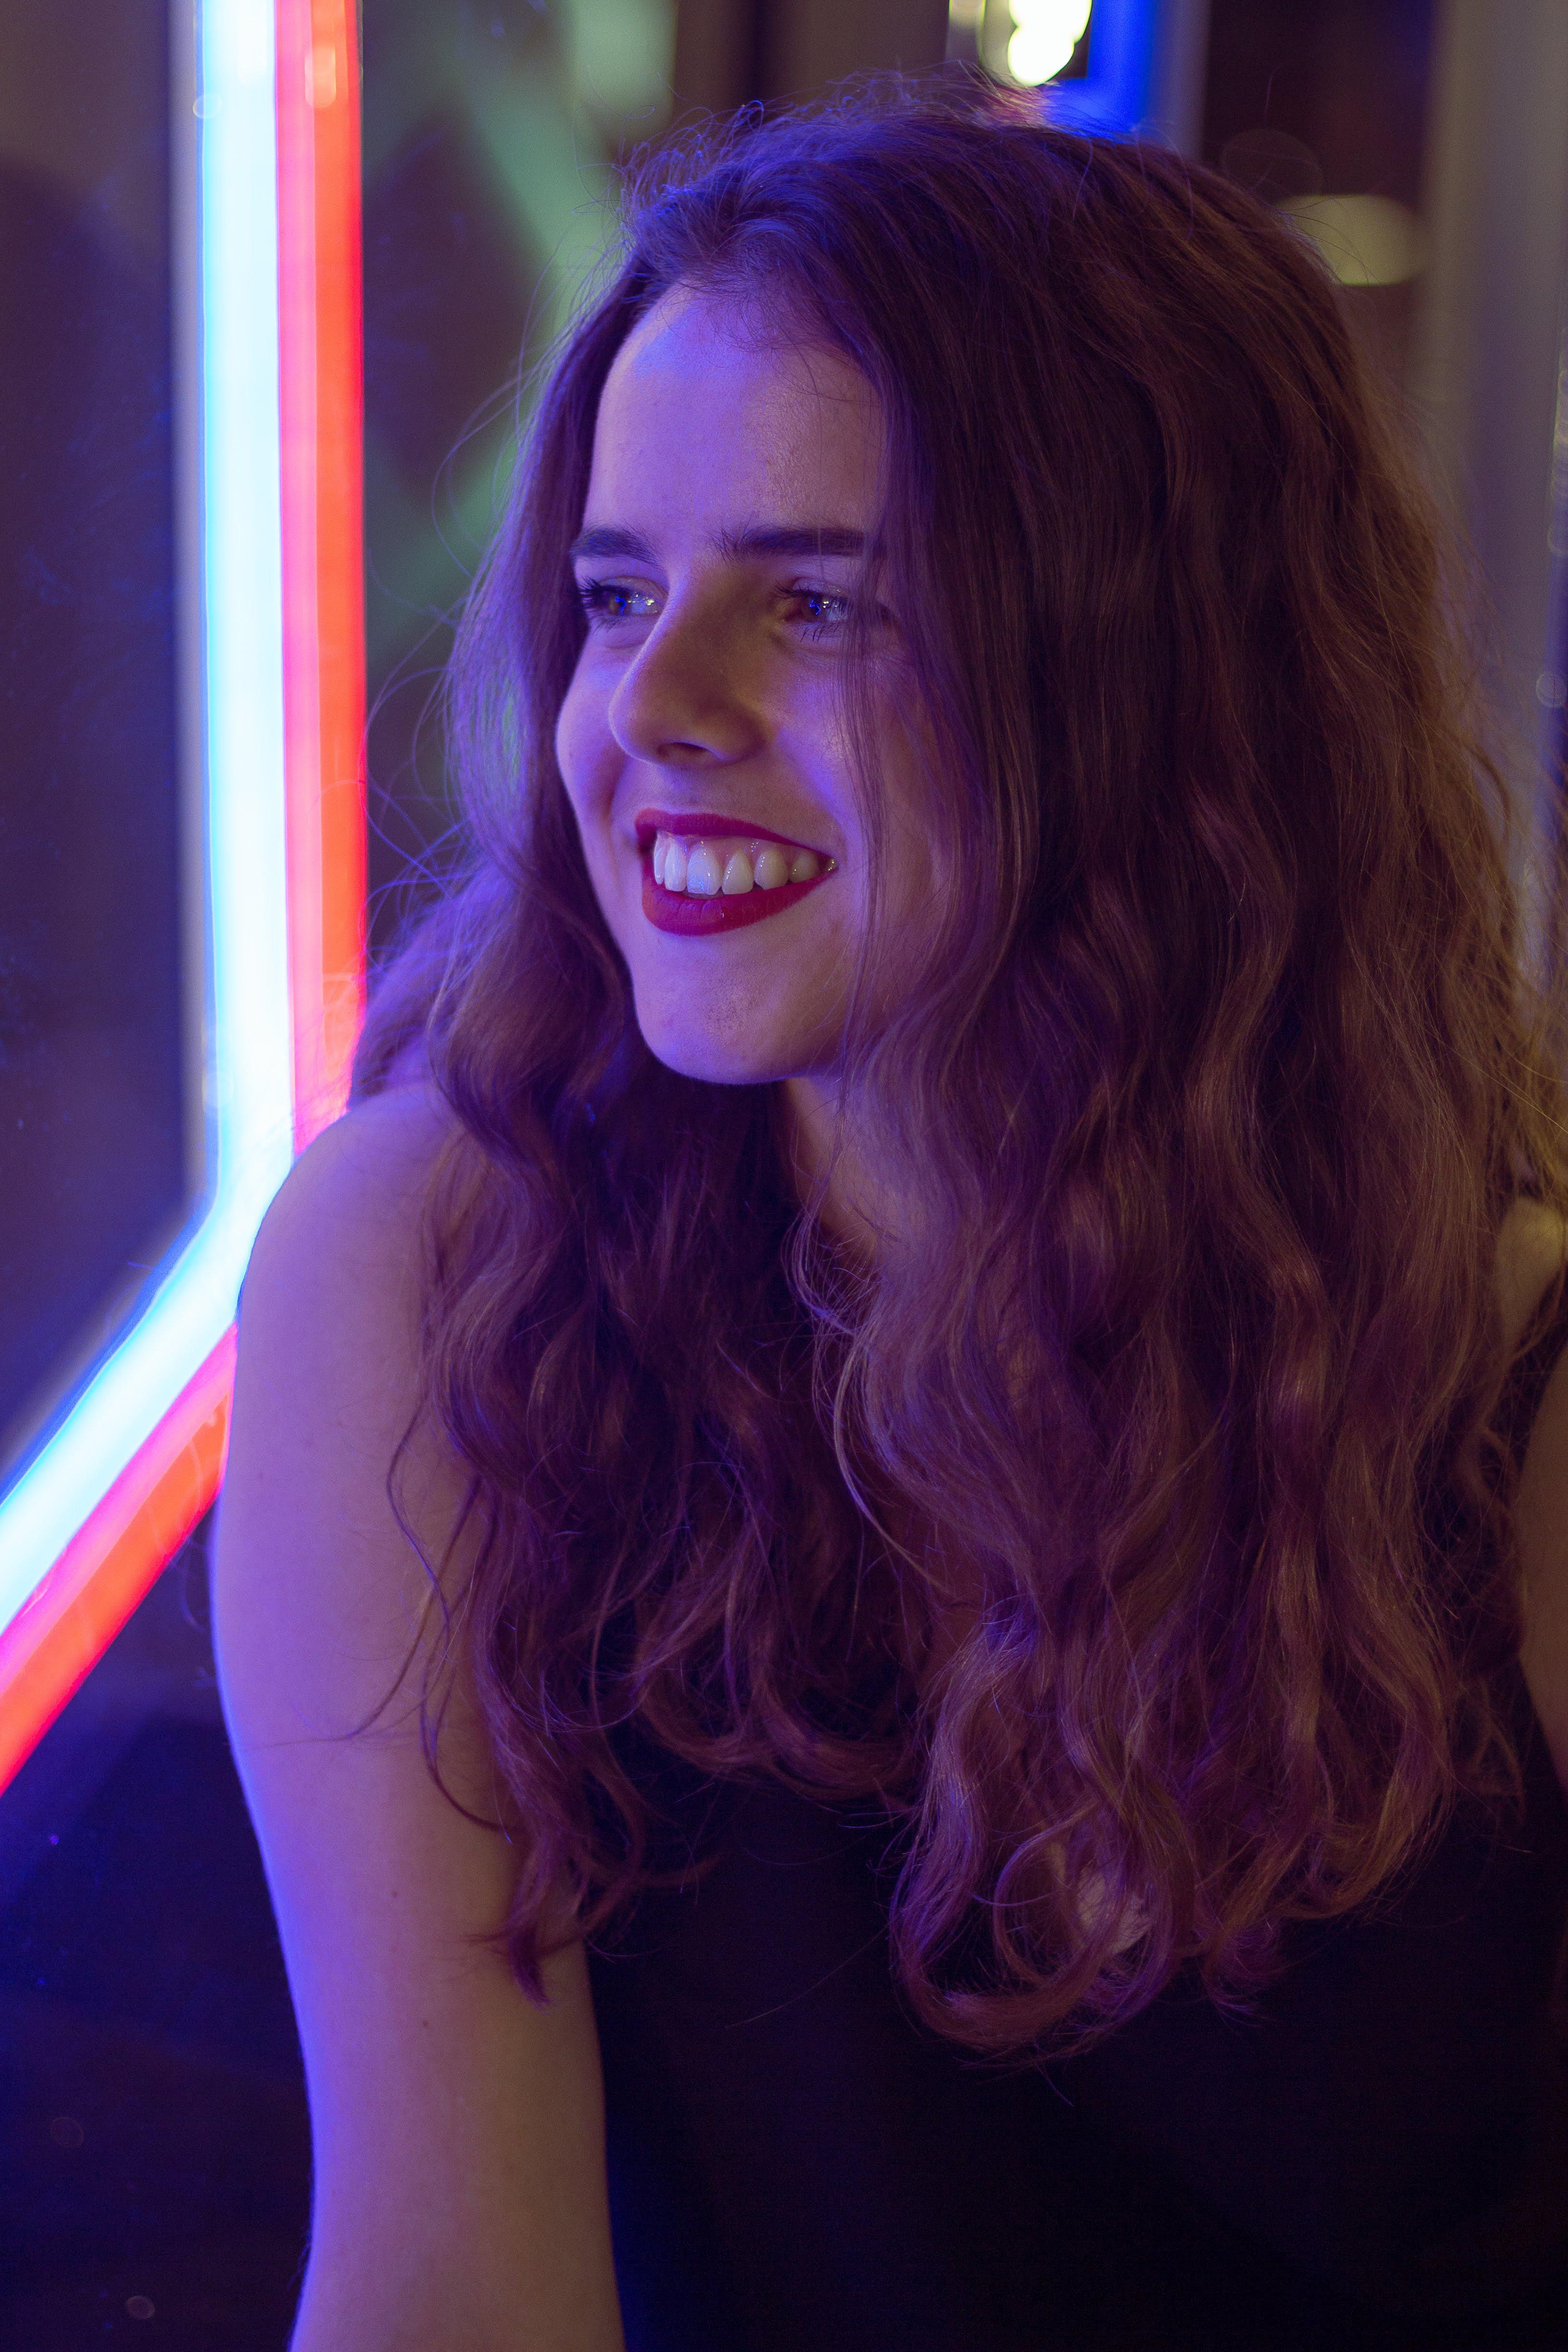 Julie Smiling Neon Portrait | Marina Bay Sands Shoppes | Singapore